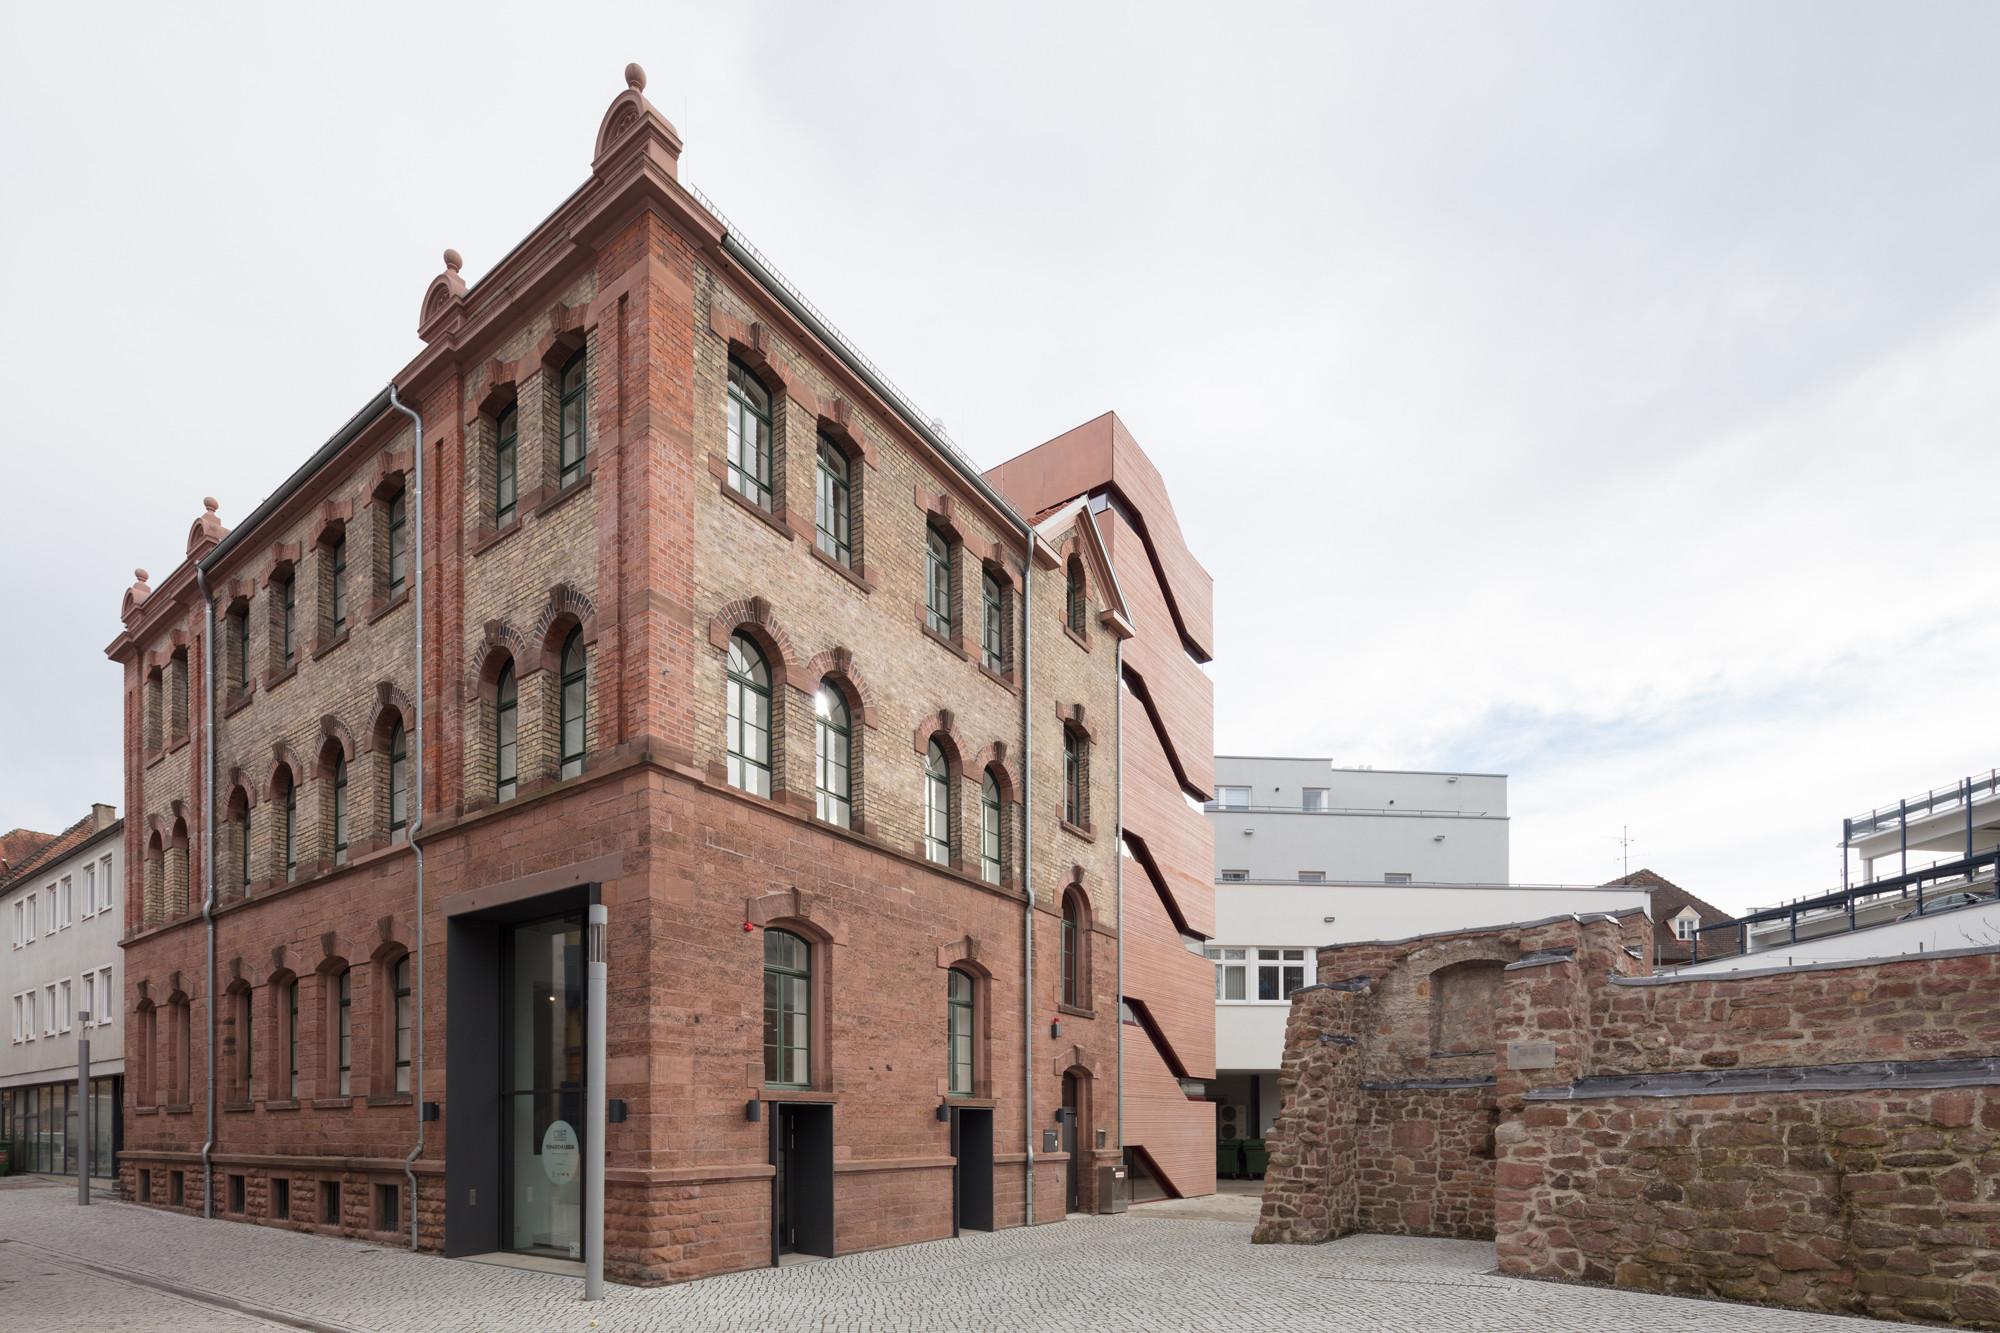 stadtmuseum tonofenfabrik in lahr beton kultur baunetz wissen. Black Bedroom Furniture Sets. Home Design Ideas